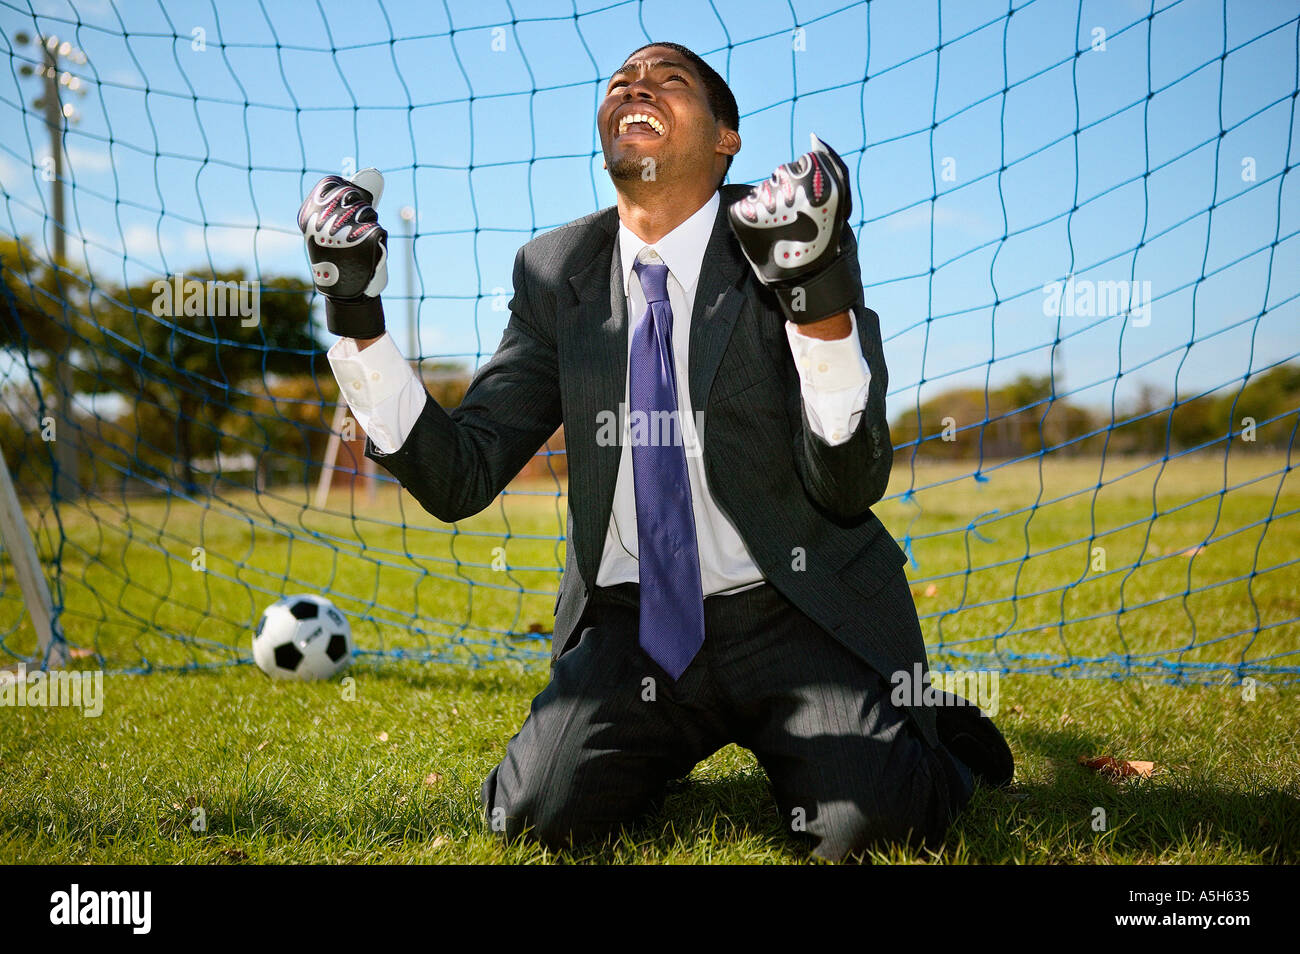 Defeated goalkeeper - Stock Image